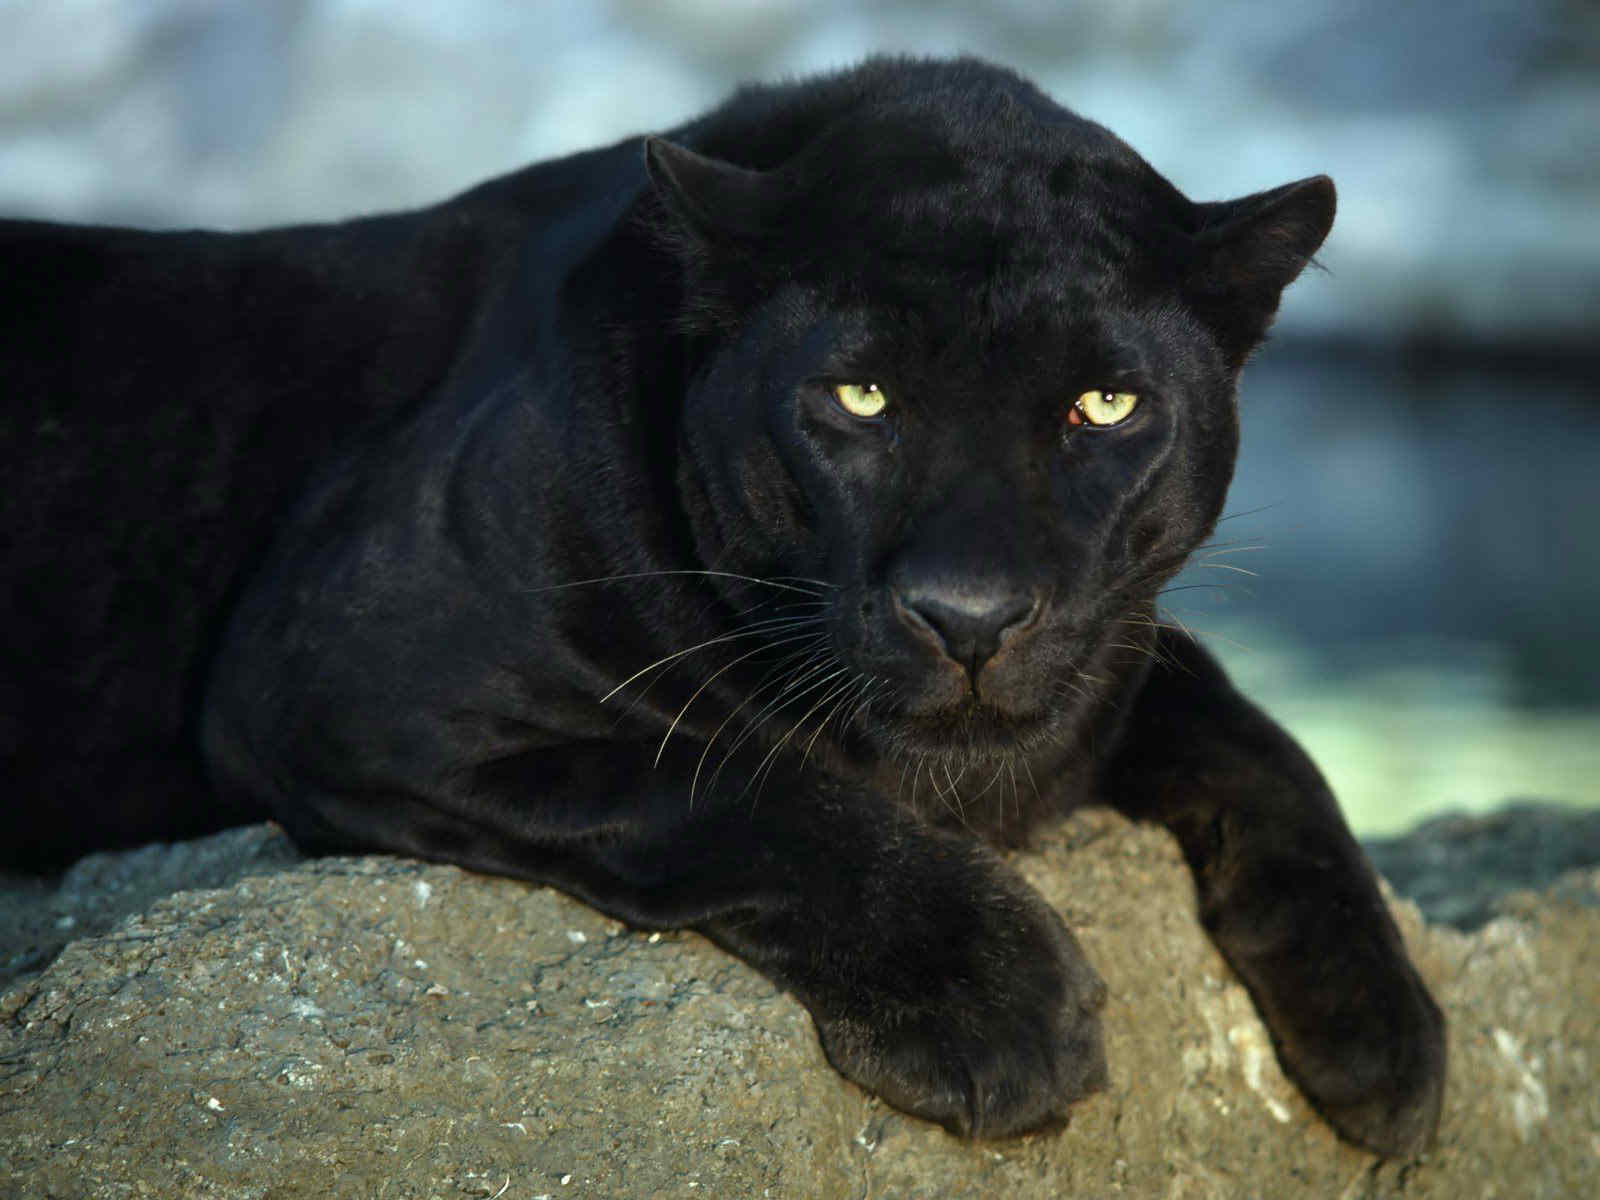 Black Jaguar Wallpaper Hd Best Collection Of Black Leopard 1600x1200